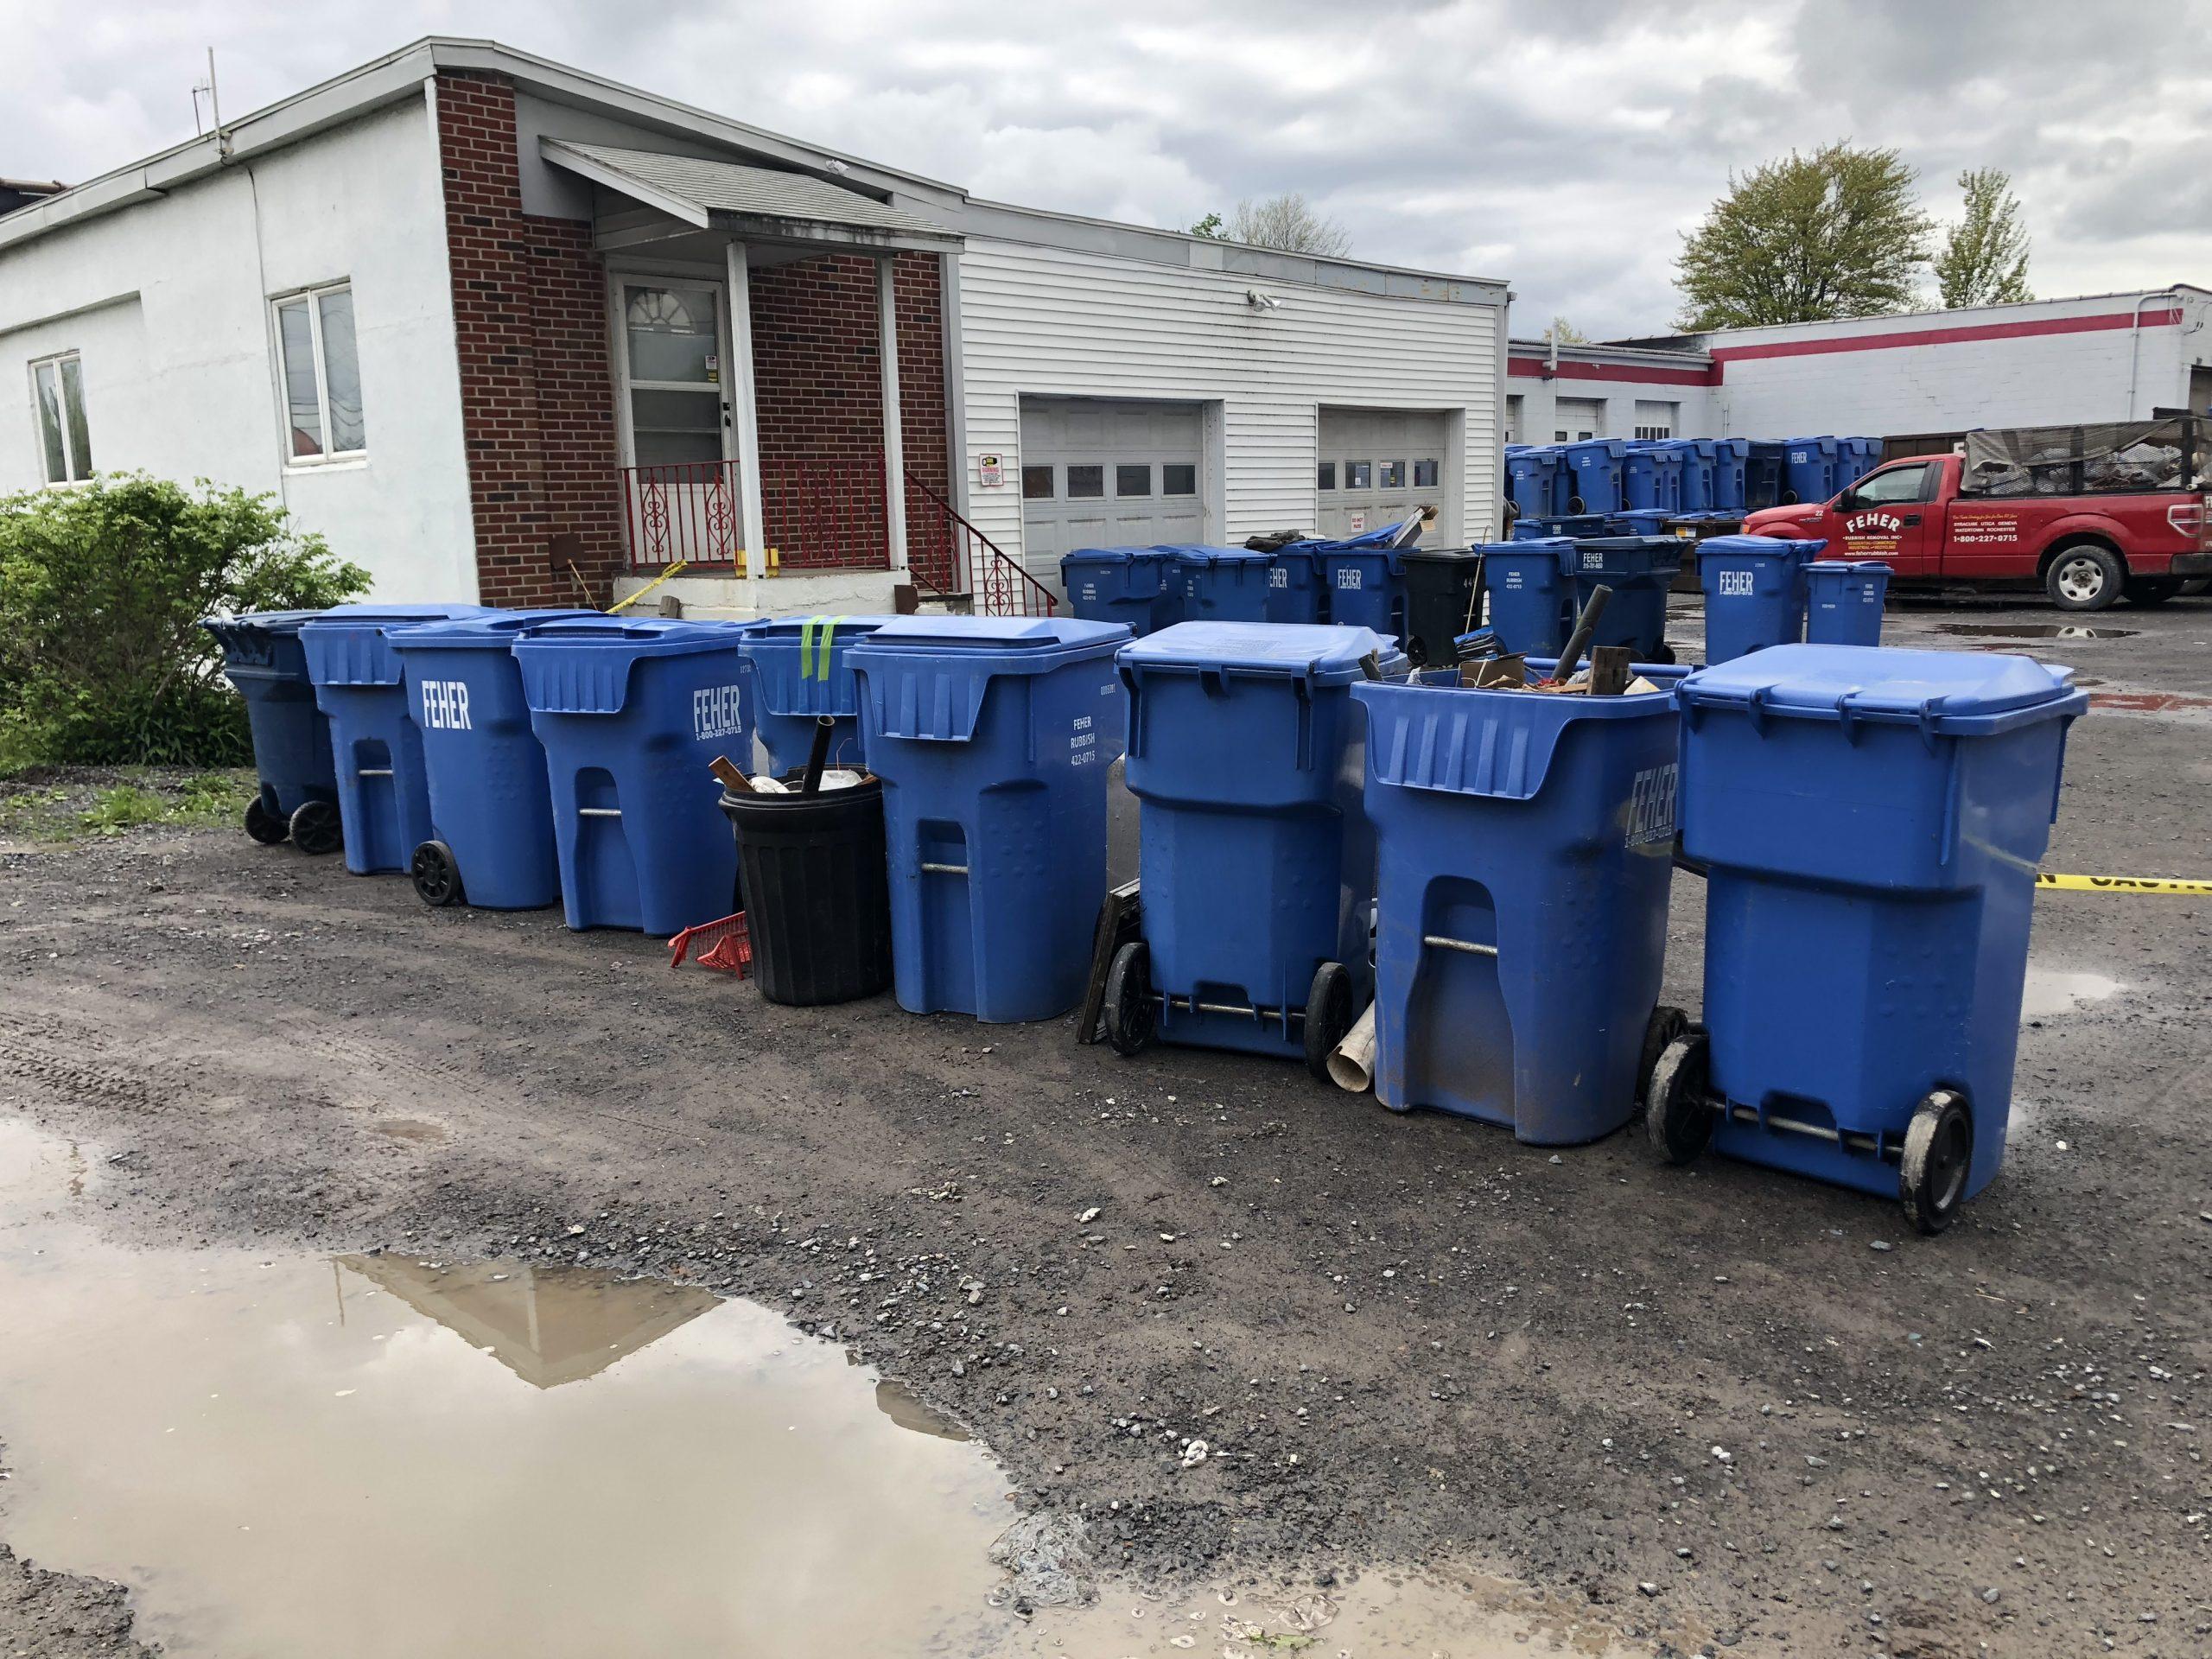 City of Geneva Update on Feher Rubbish Trash Removal